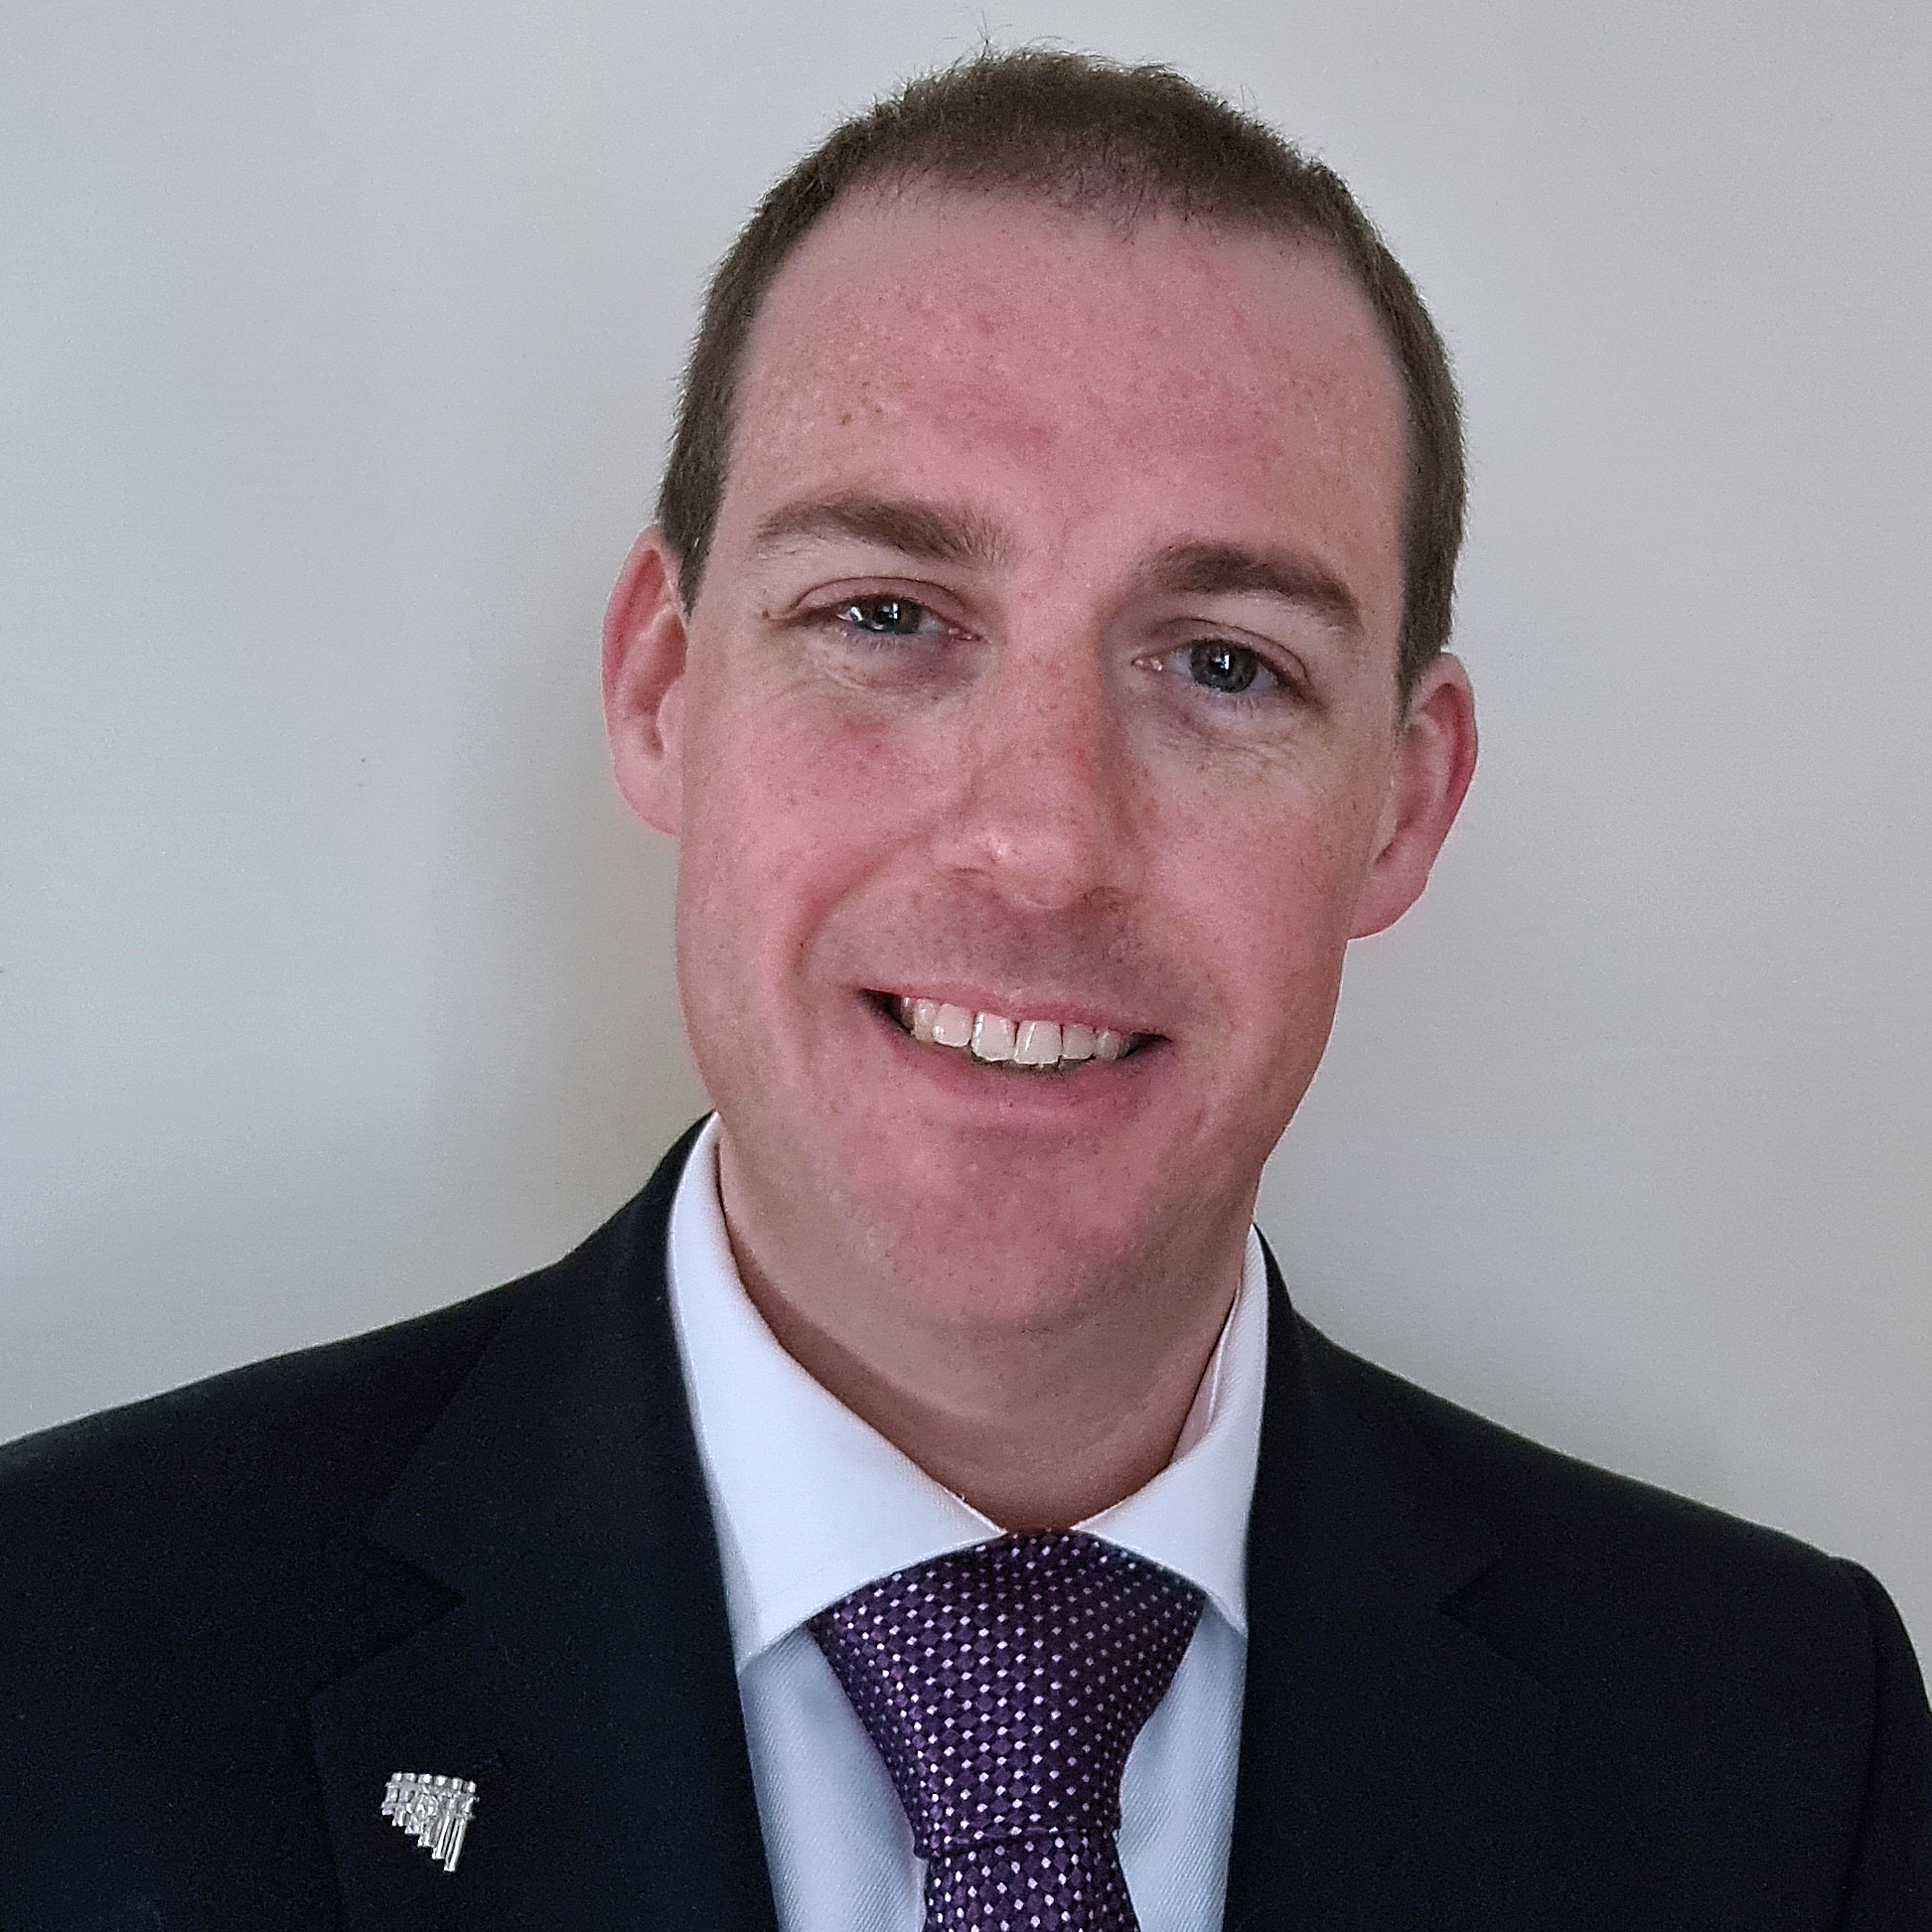 Dr Doug Millington-Smith, Applications Manager at QLM